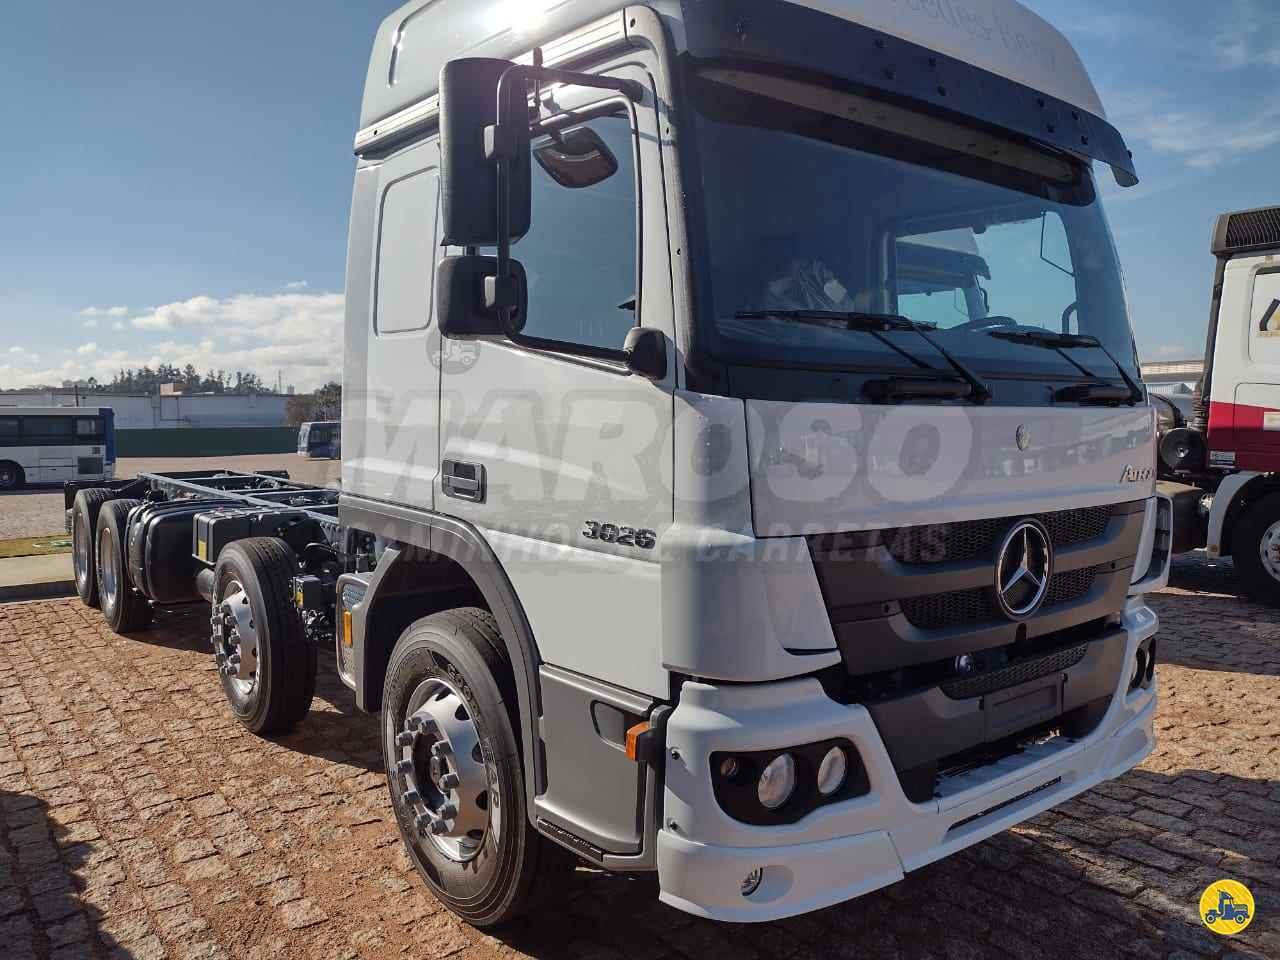 MB 3026 de Maroso Caminhões - PALOTINA/PR